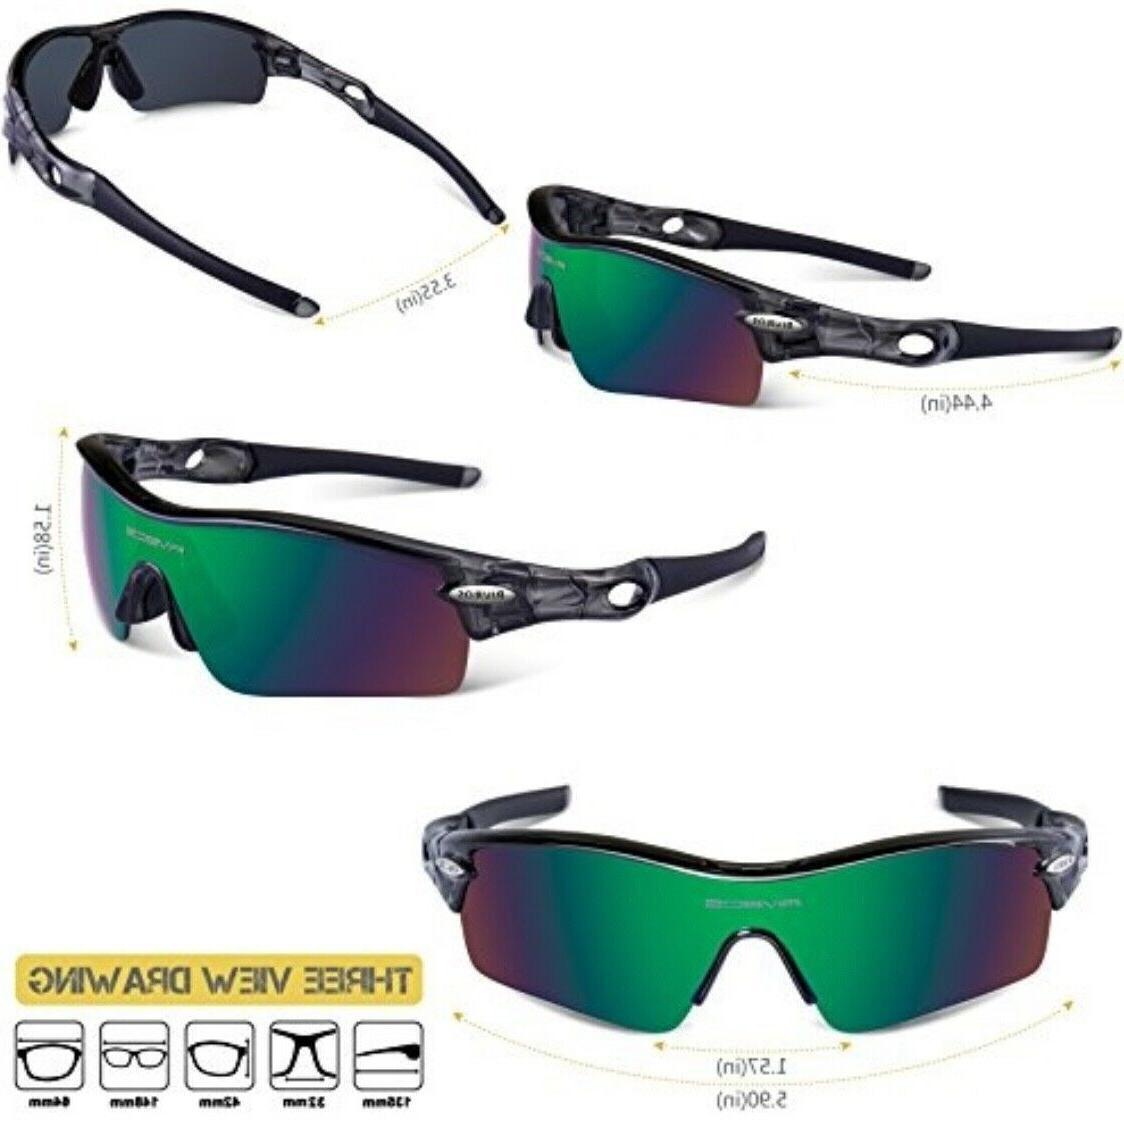 RIVBOS POLARIZED Sunglasses Interchangeable